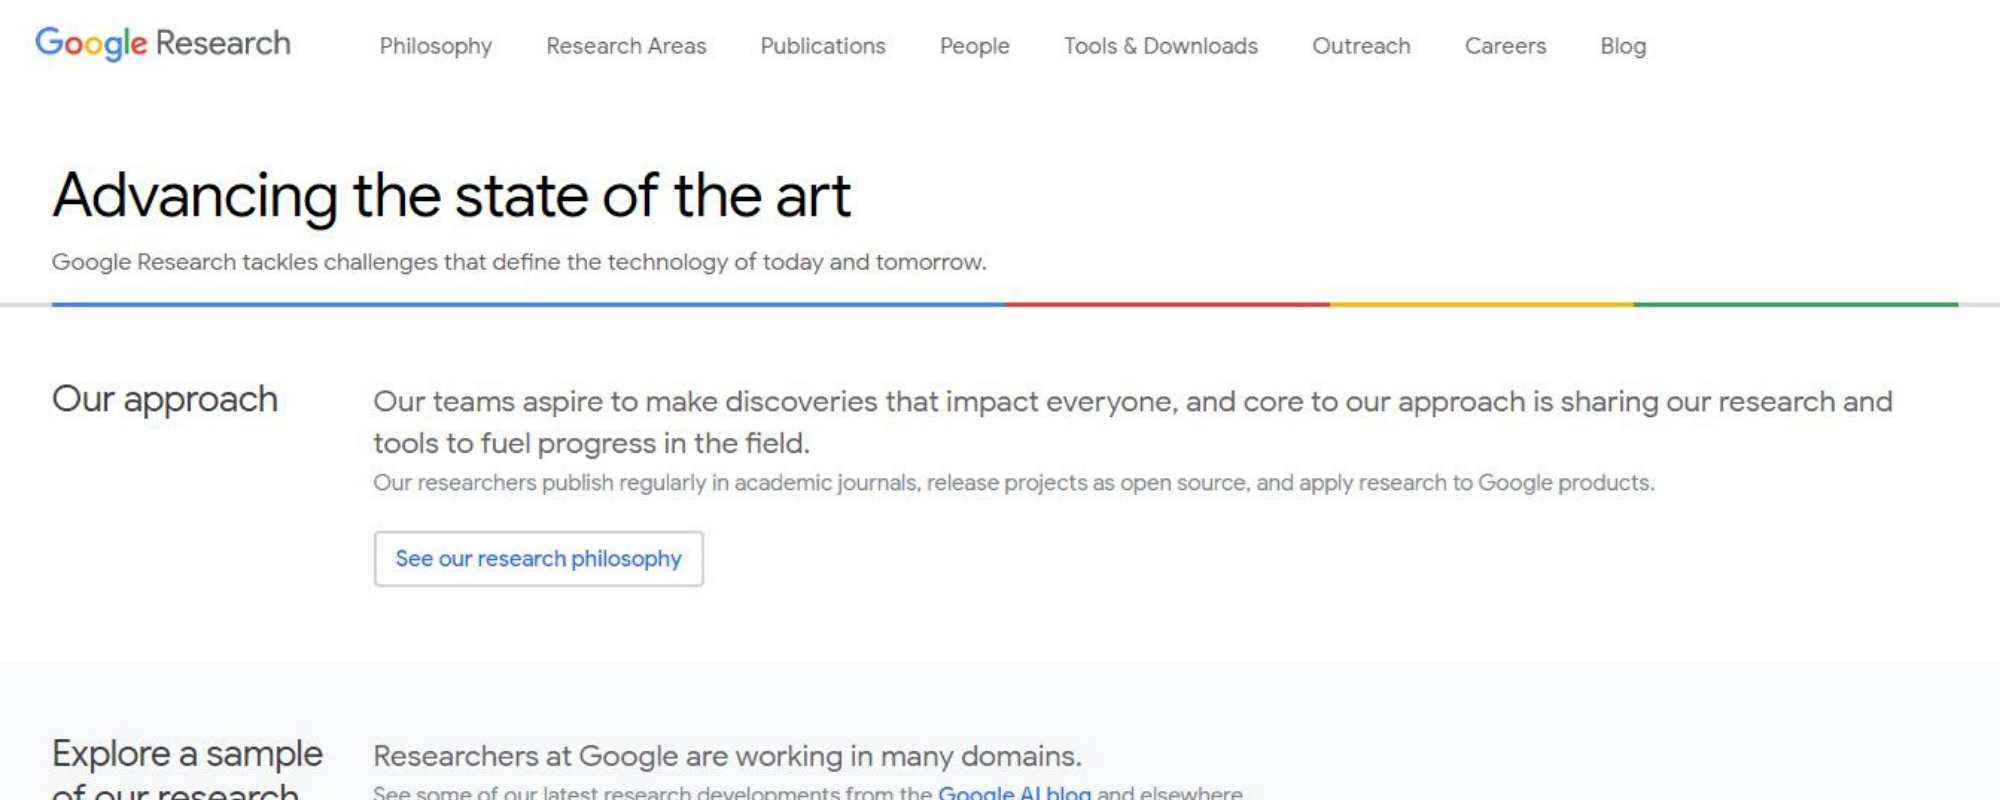 googlesearch blog